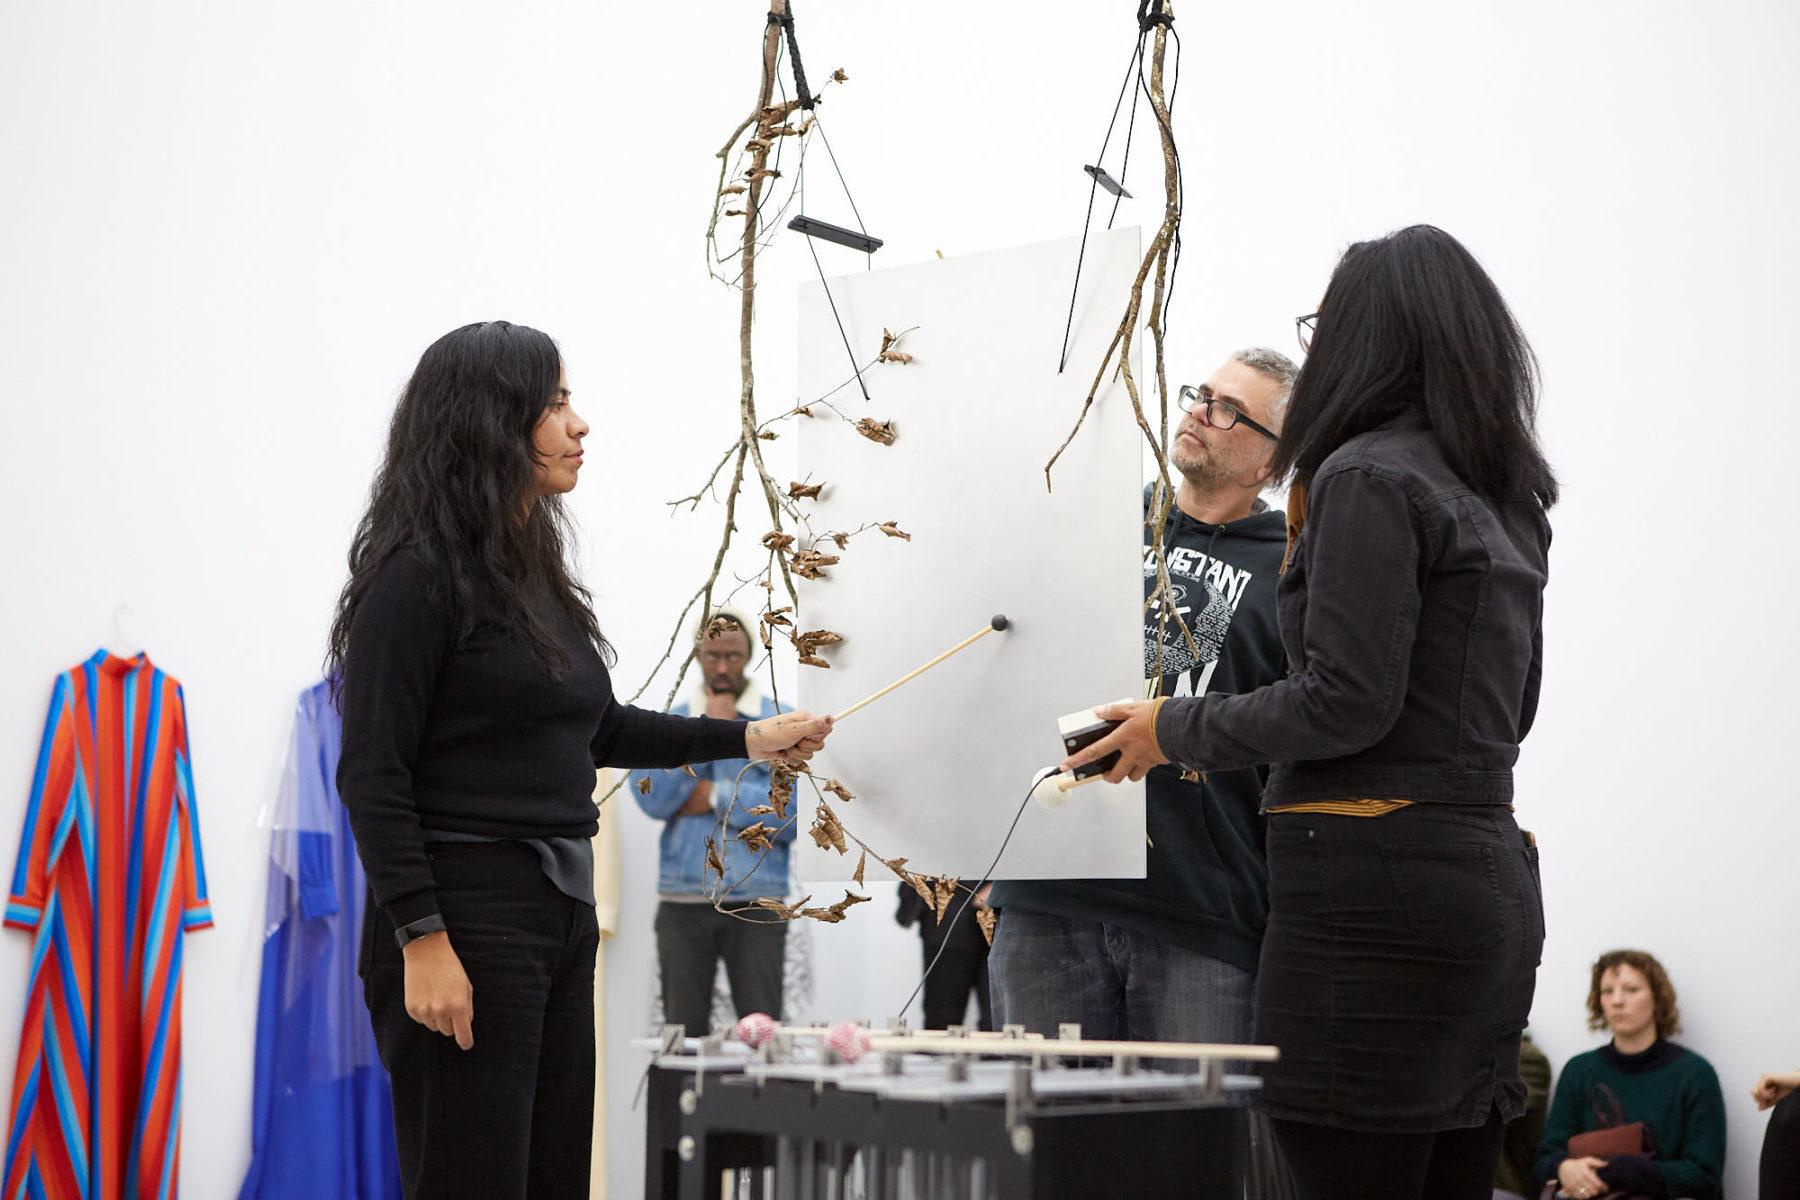 Sriwhana Spong Ida-Ida (2019) Performance still, Uniform art collective, Spike Island, Bristol. Photograph by Max McClure